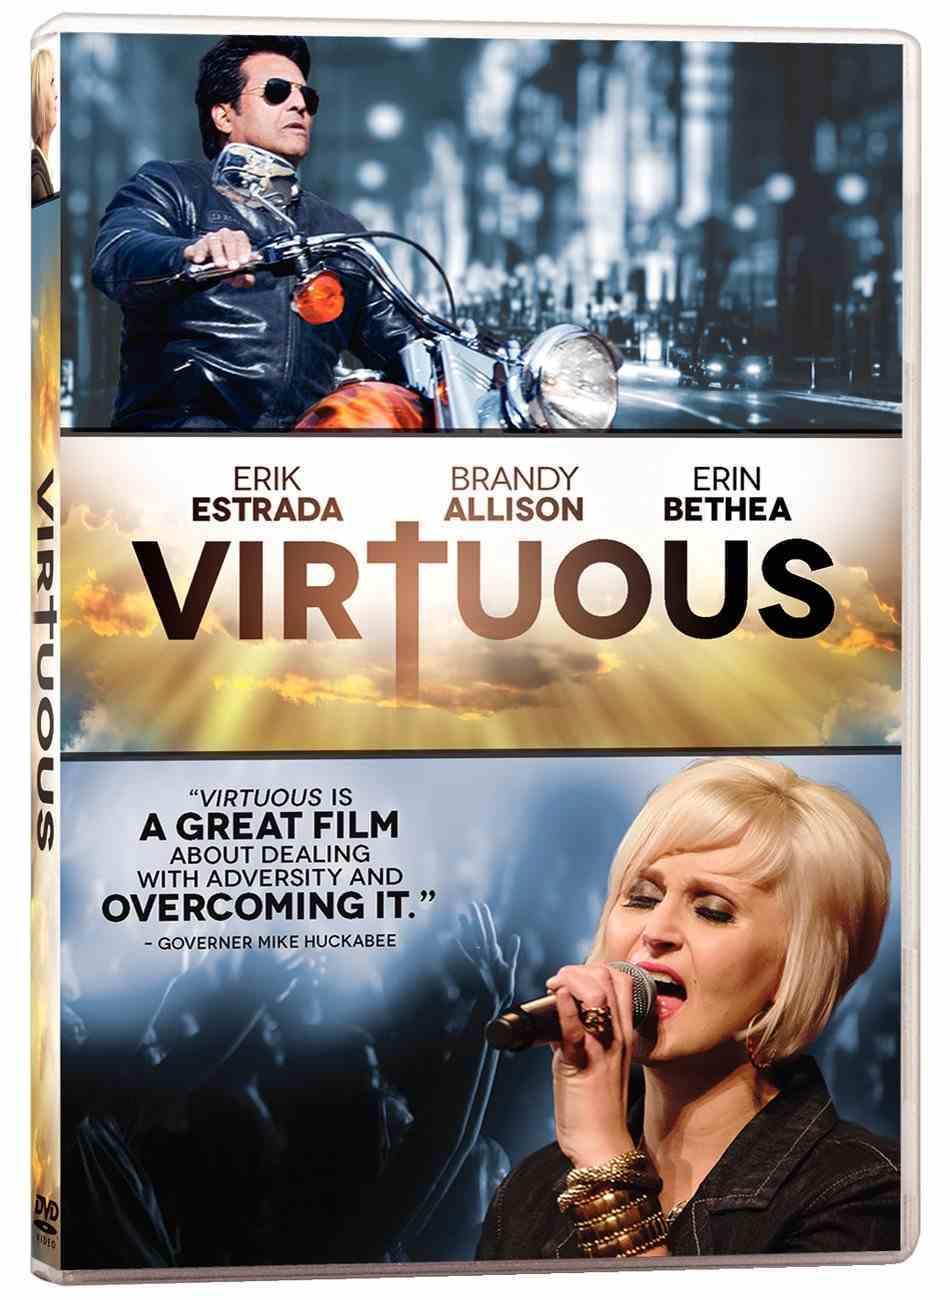 Virtuous DVD